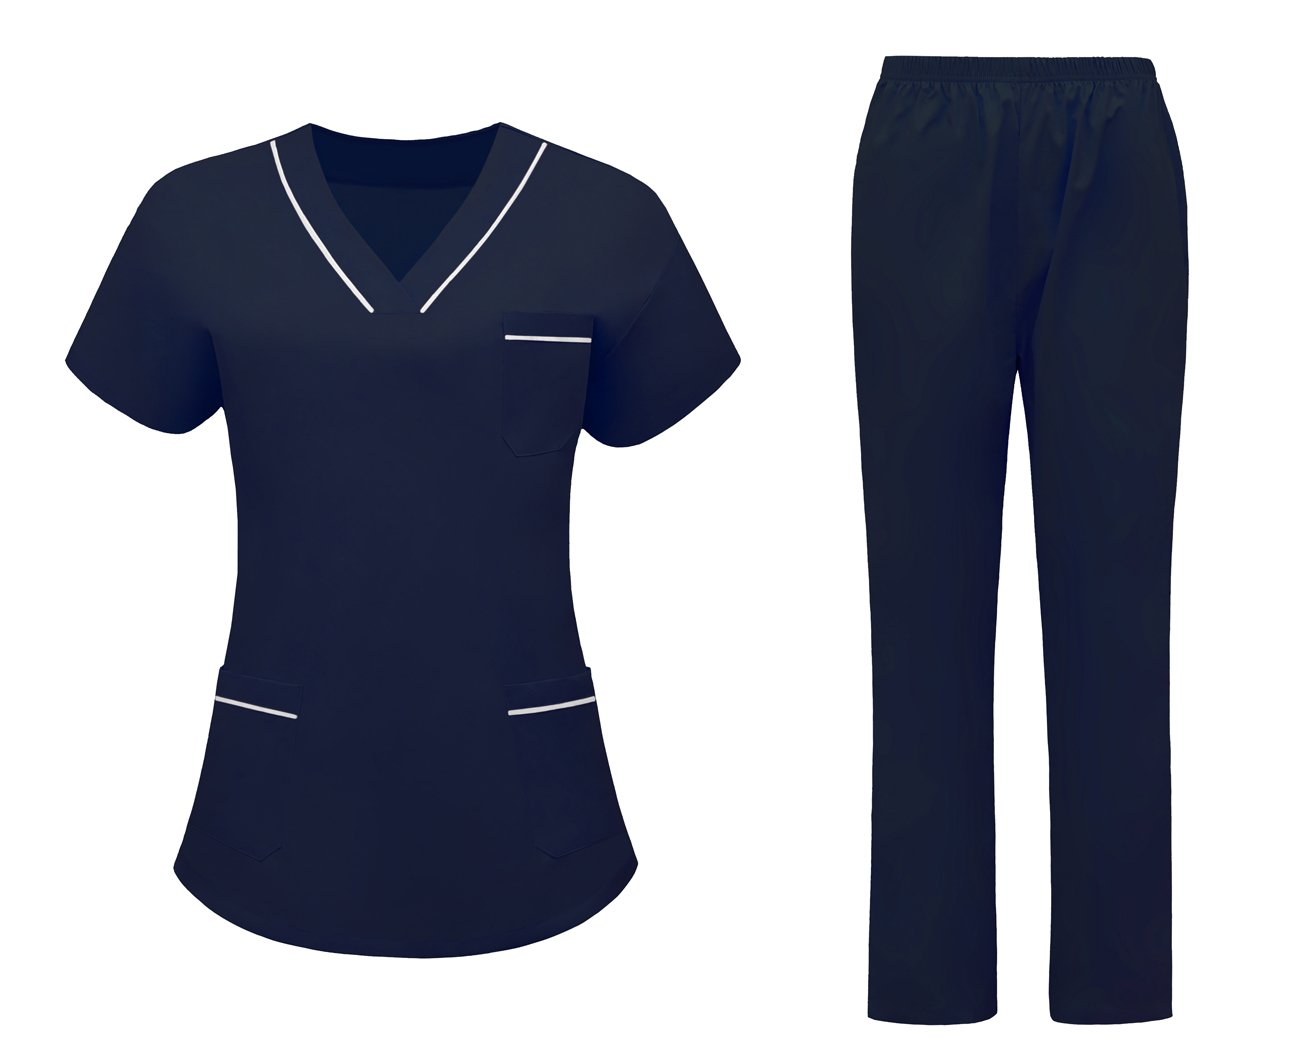 AURNEW Scrubs Medical Uniform Women and Man Scrubs Set Medical Scrubs Top and Pants (Navy, S)